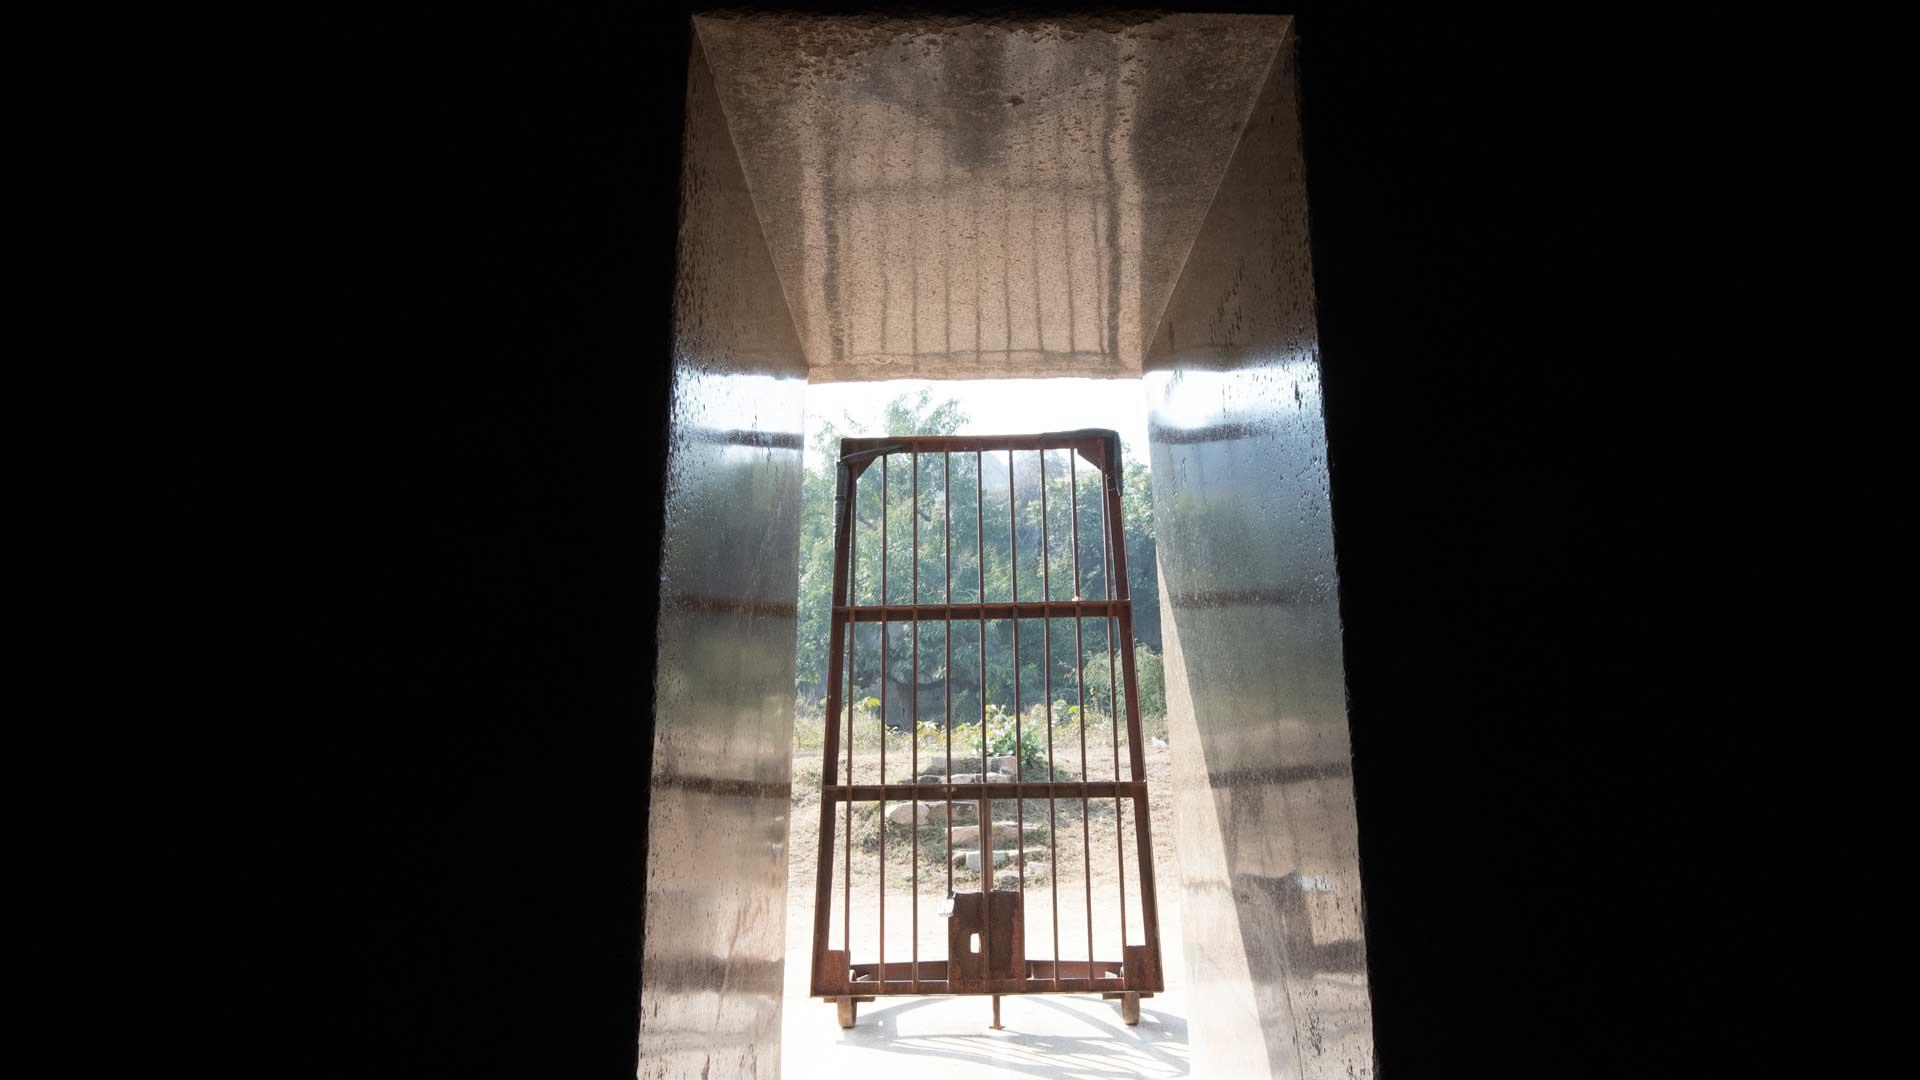 Barabar-BAM-film-granit-miroir-pyramide-inde-yoga-archeologie-10